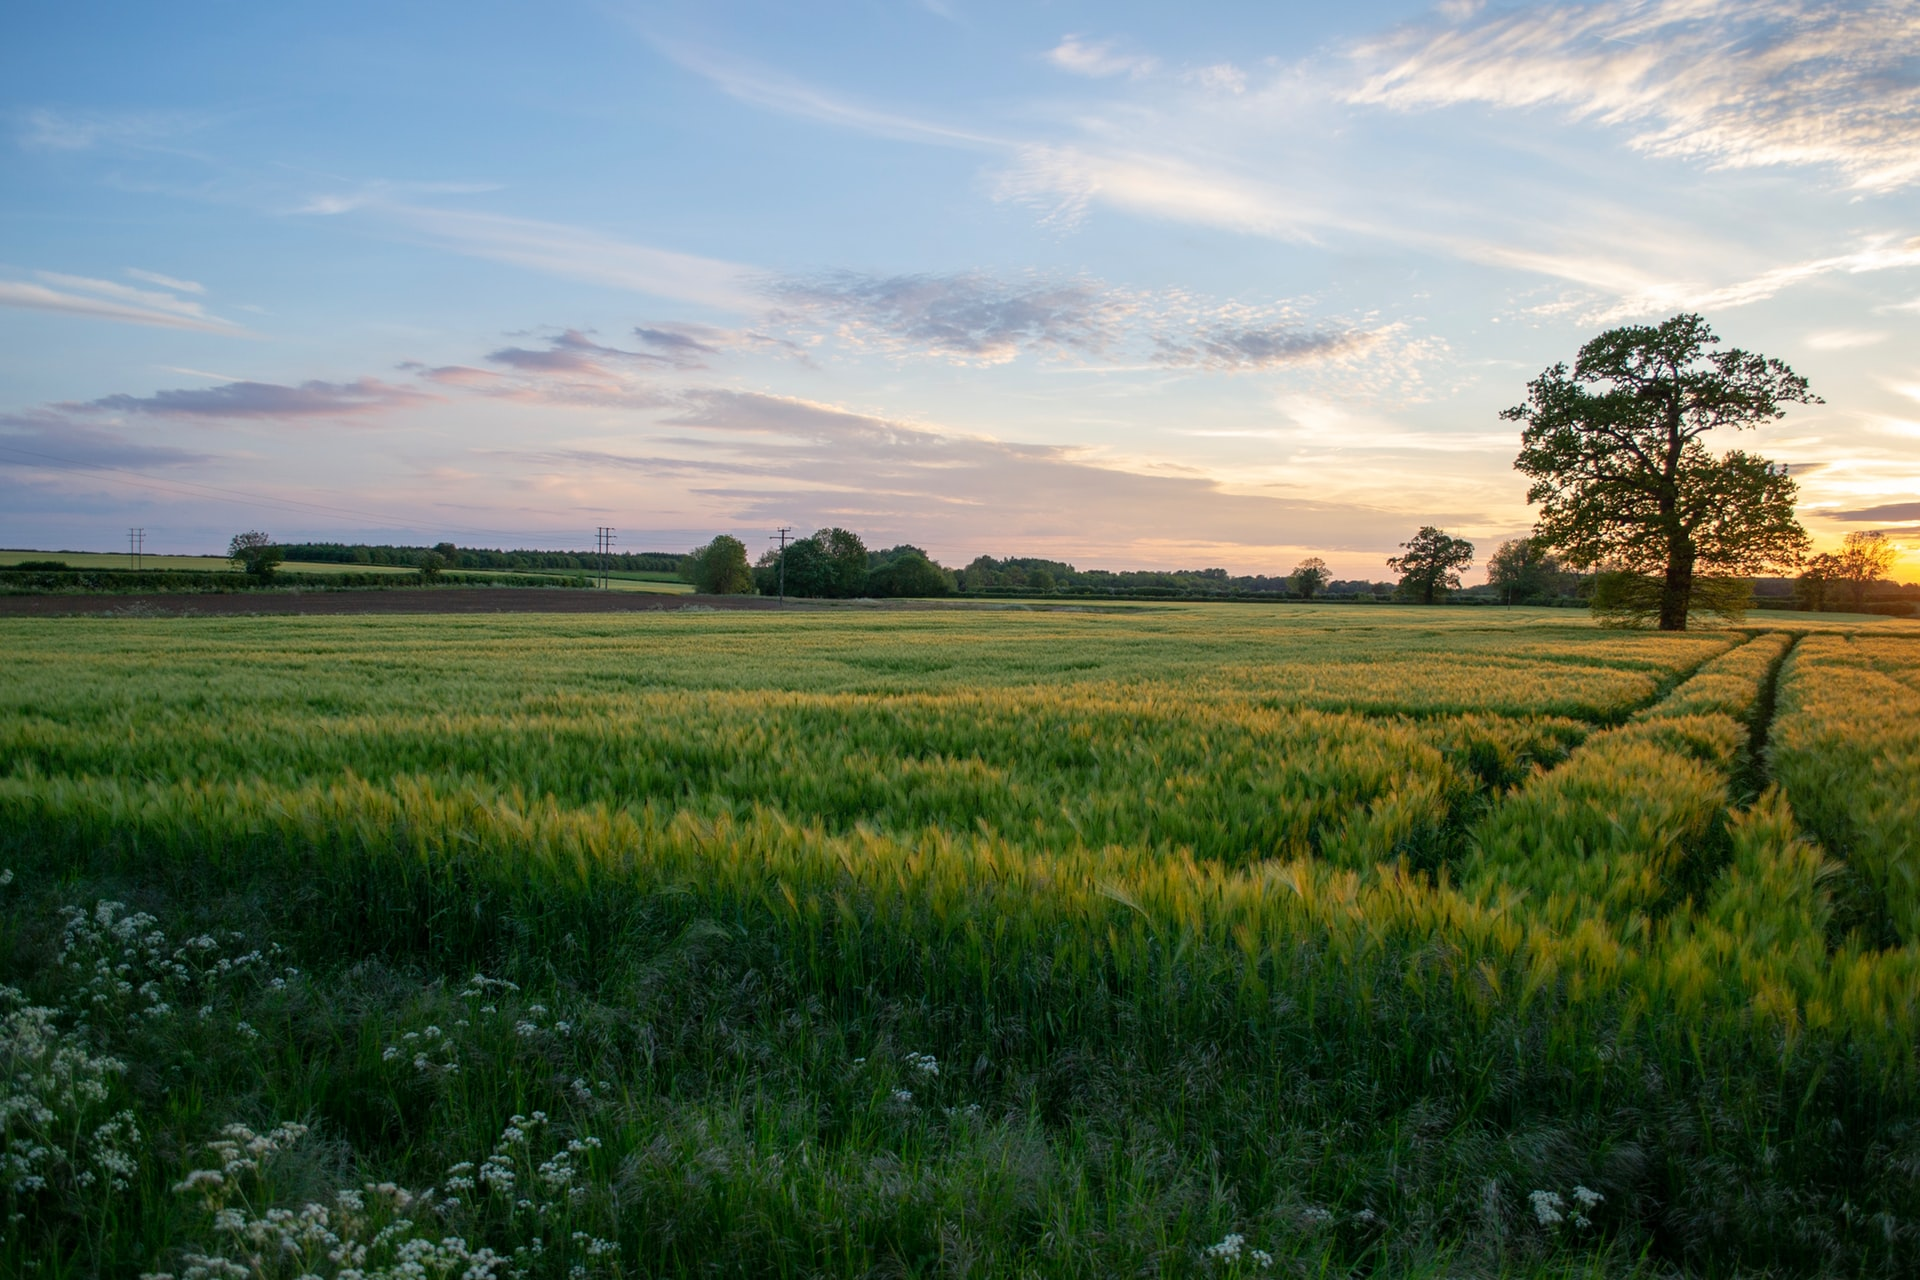 Grass field at sunset. Credit. Simon Godfrey, Unsplash